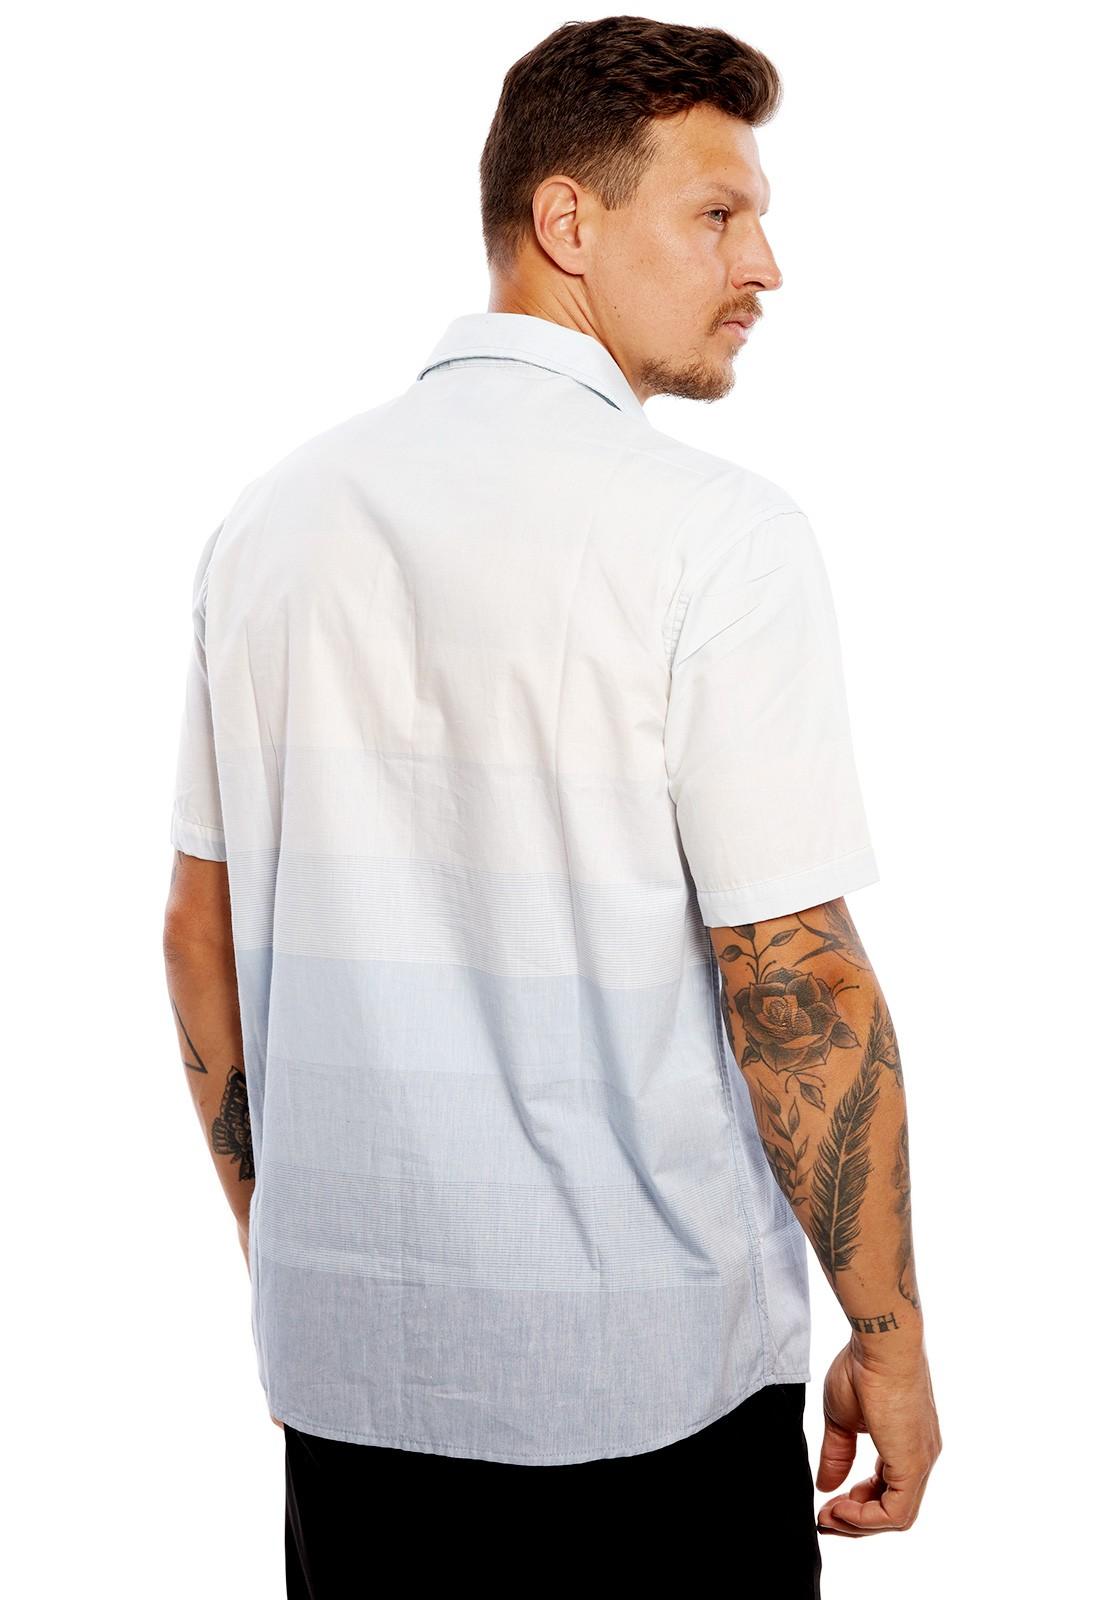 Camisa Vida Marinha Manga Curta Degradê Azul/Branco